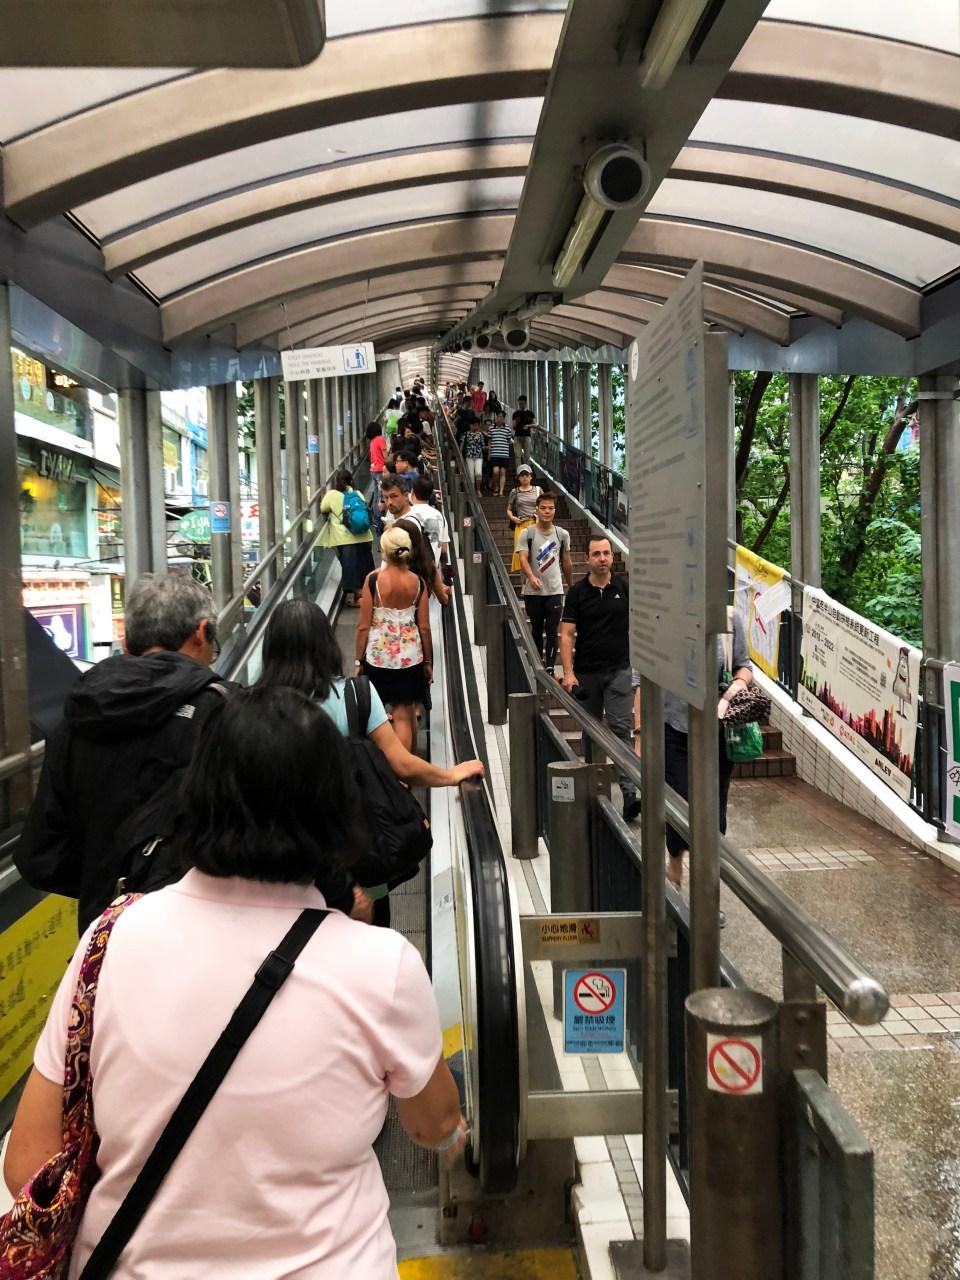 Hong Kong - Central Escalators 1